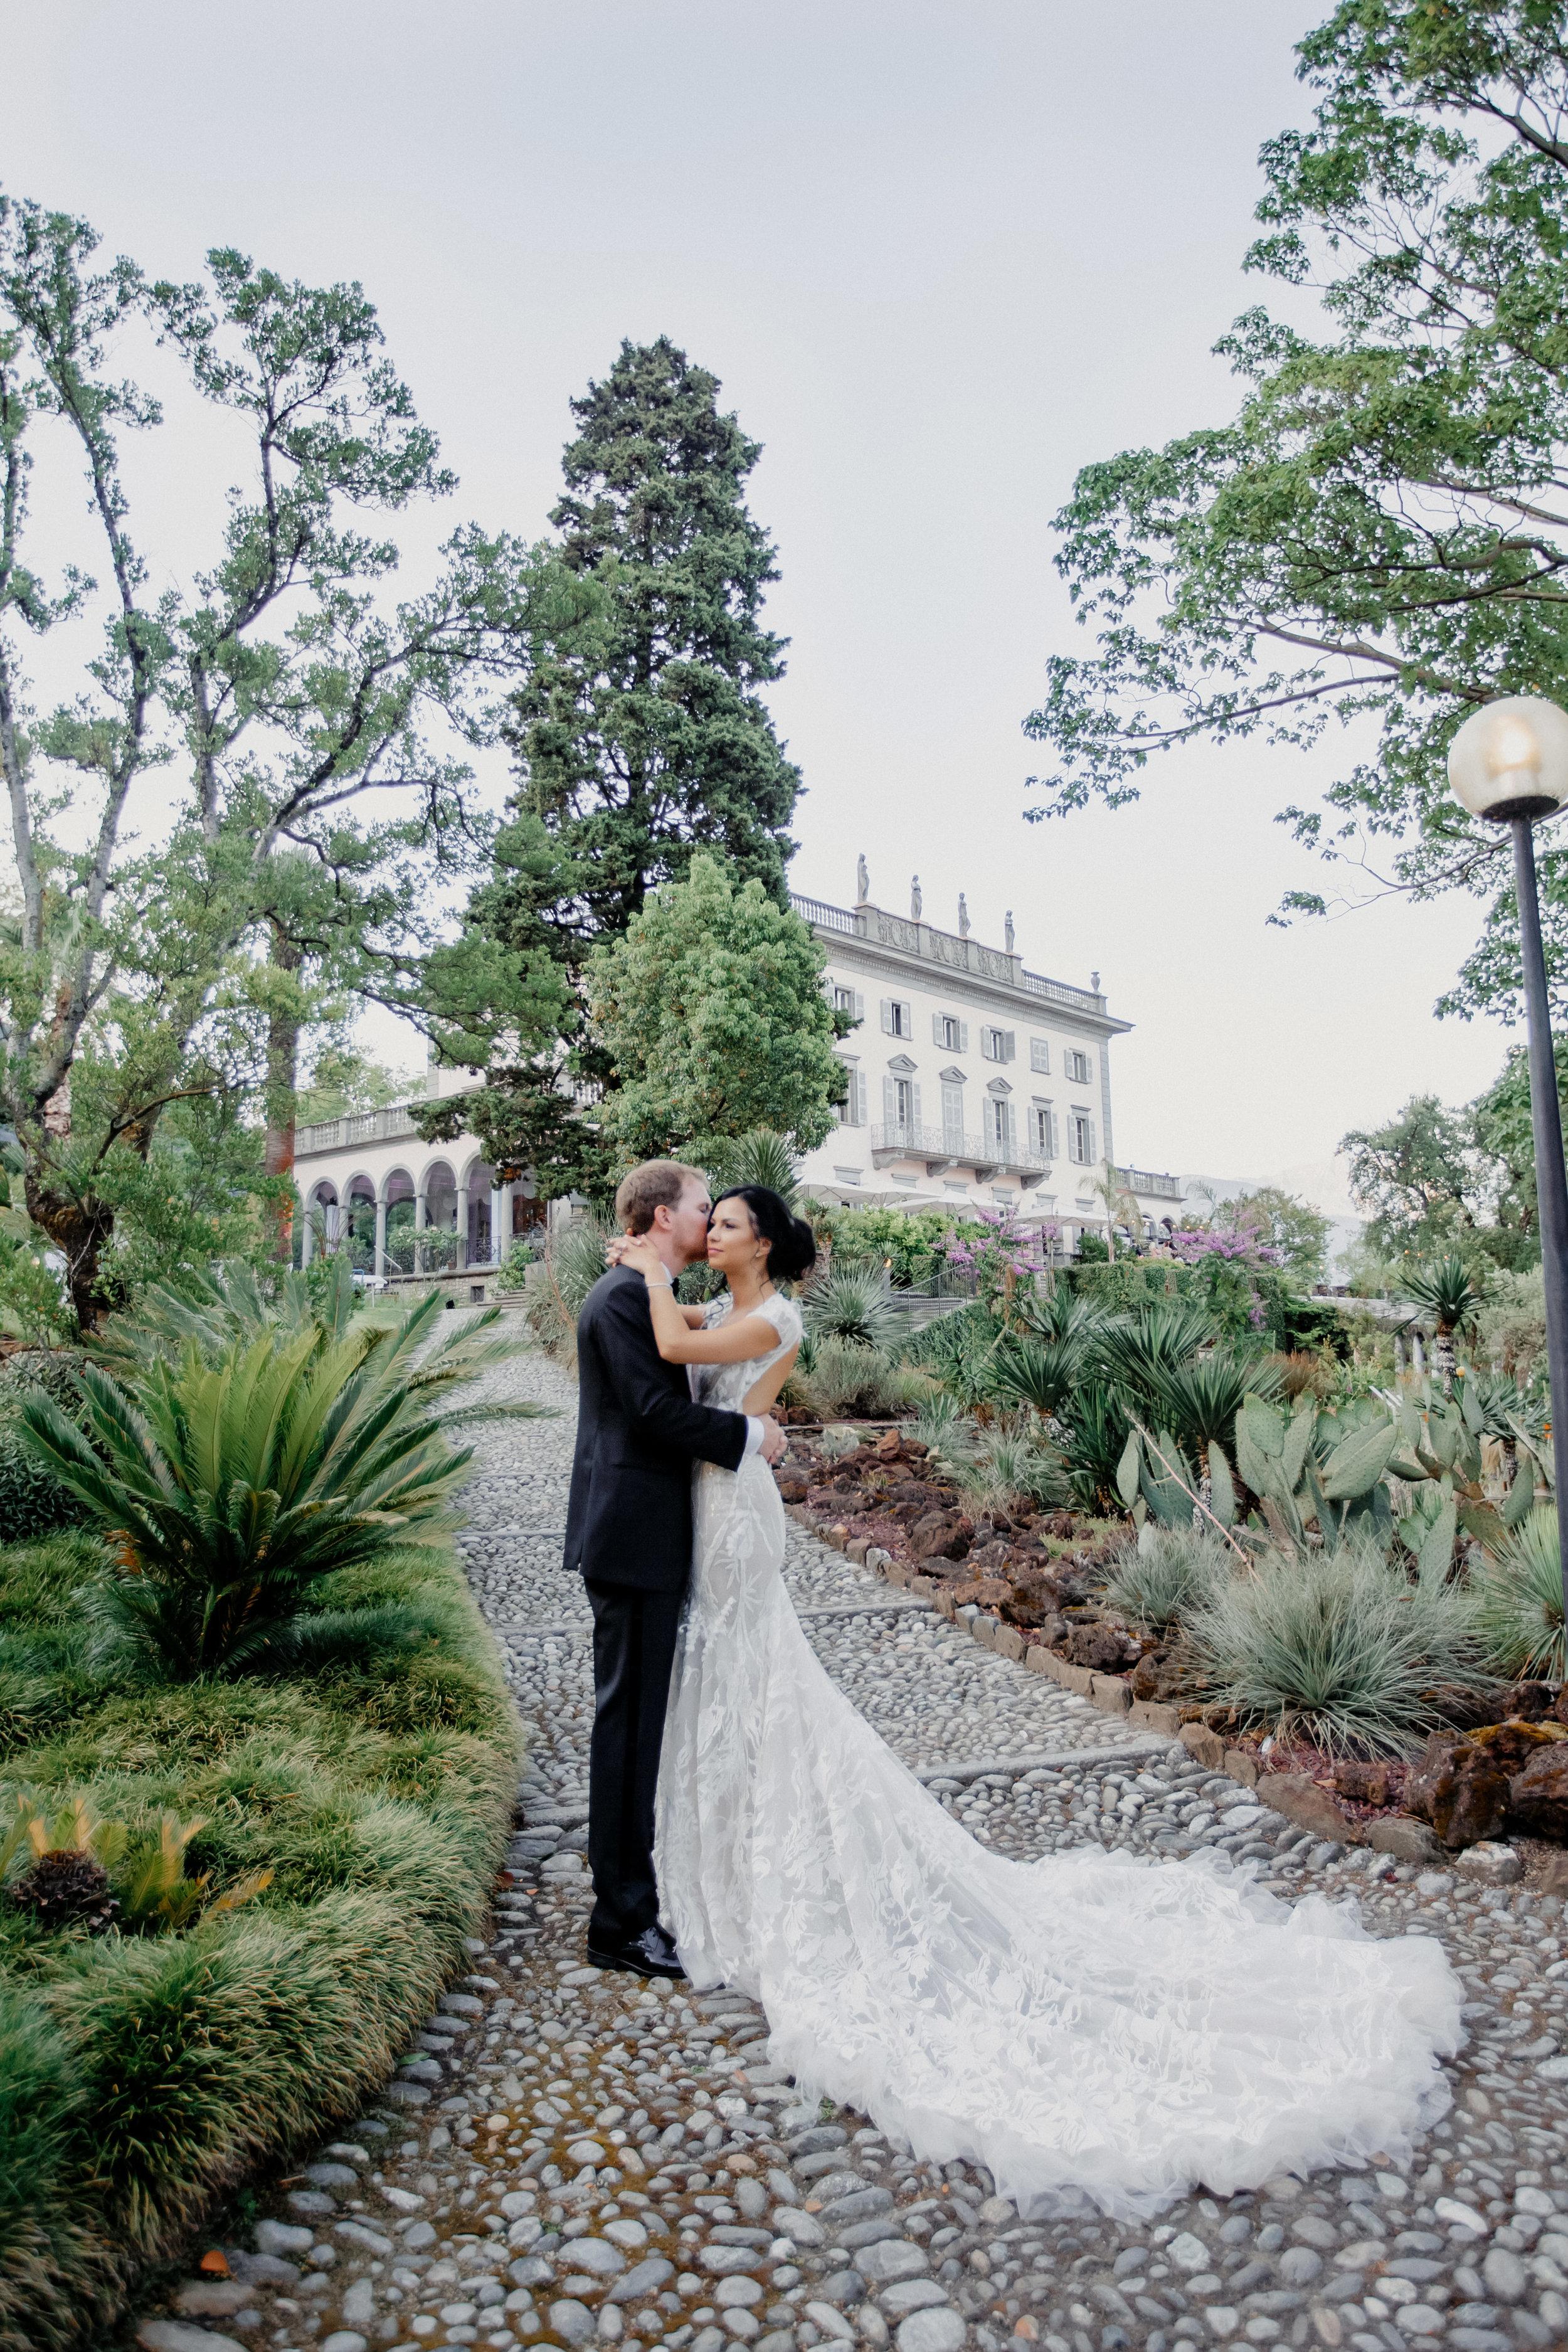 180707-preview-099-Marina-Fadeeva-wedding-photographer.jpg